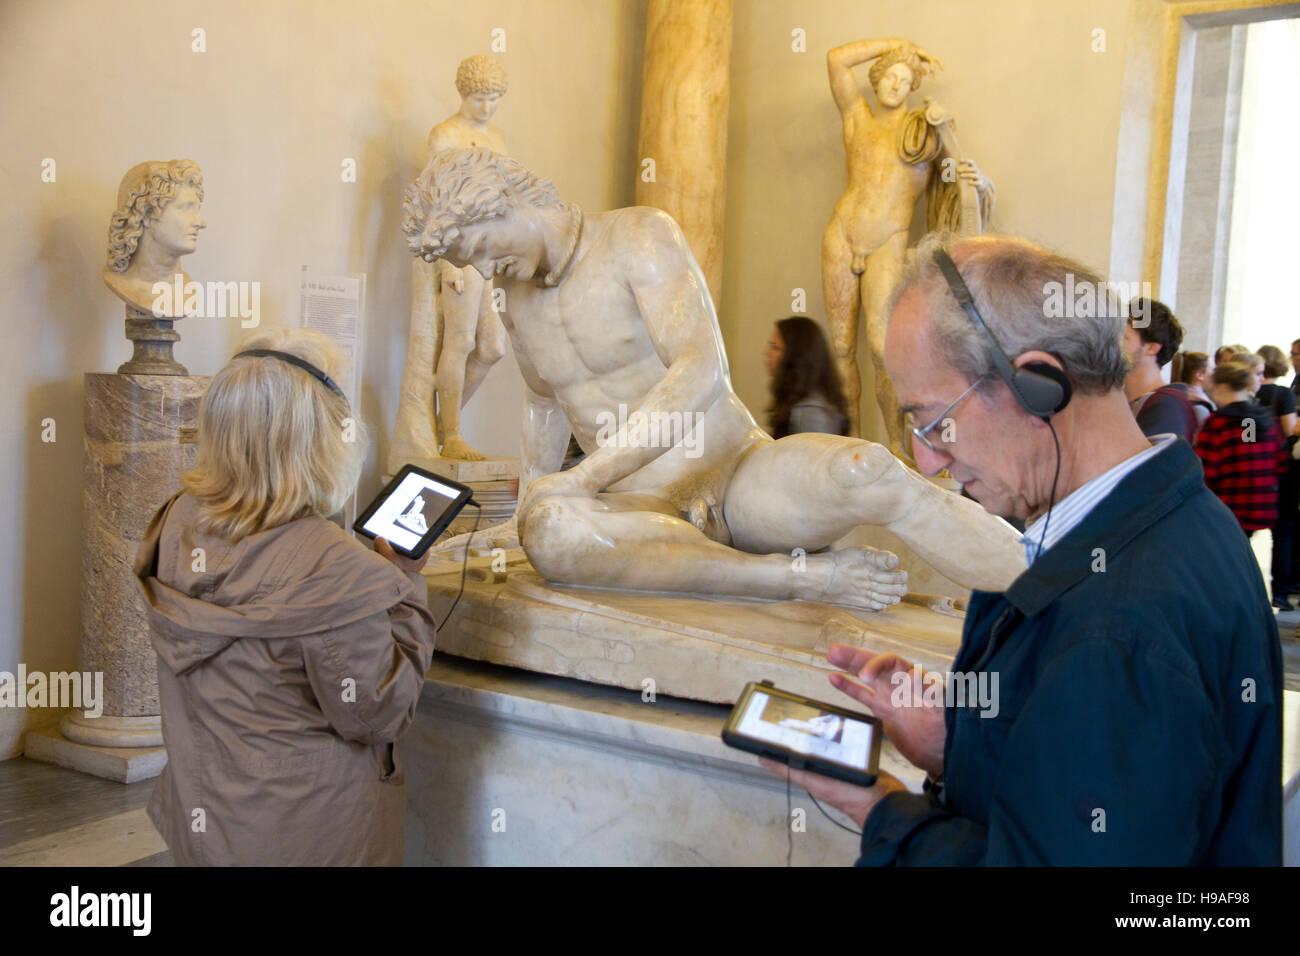 Tourist looking statue art scene Rome, italy, capitoline museums,  musei capitolini, art heritage touristic landmark - Stock Image